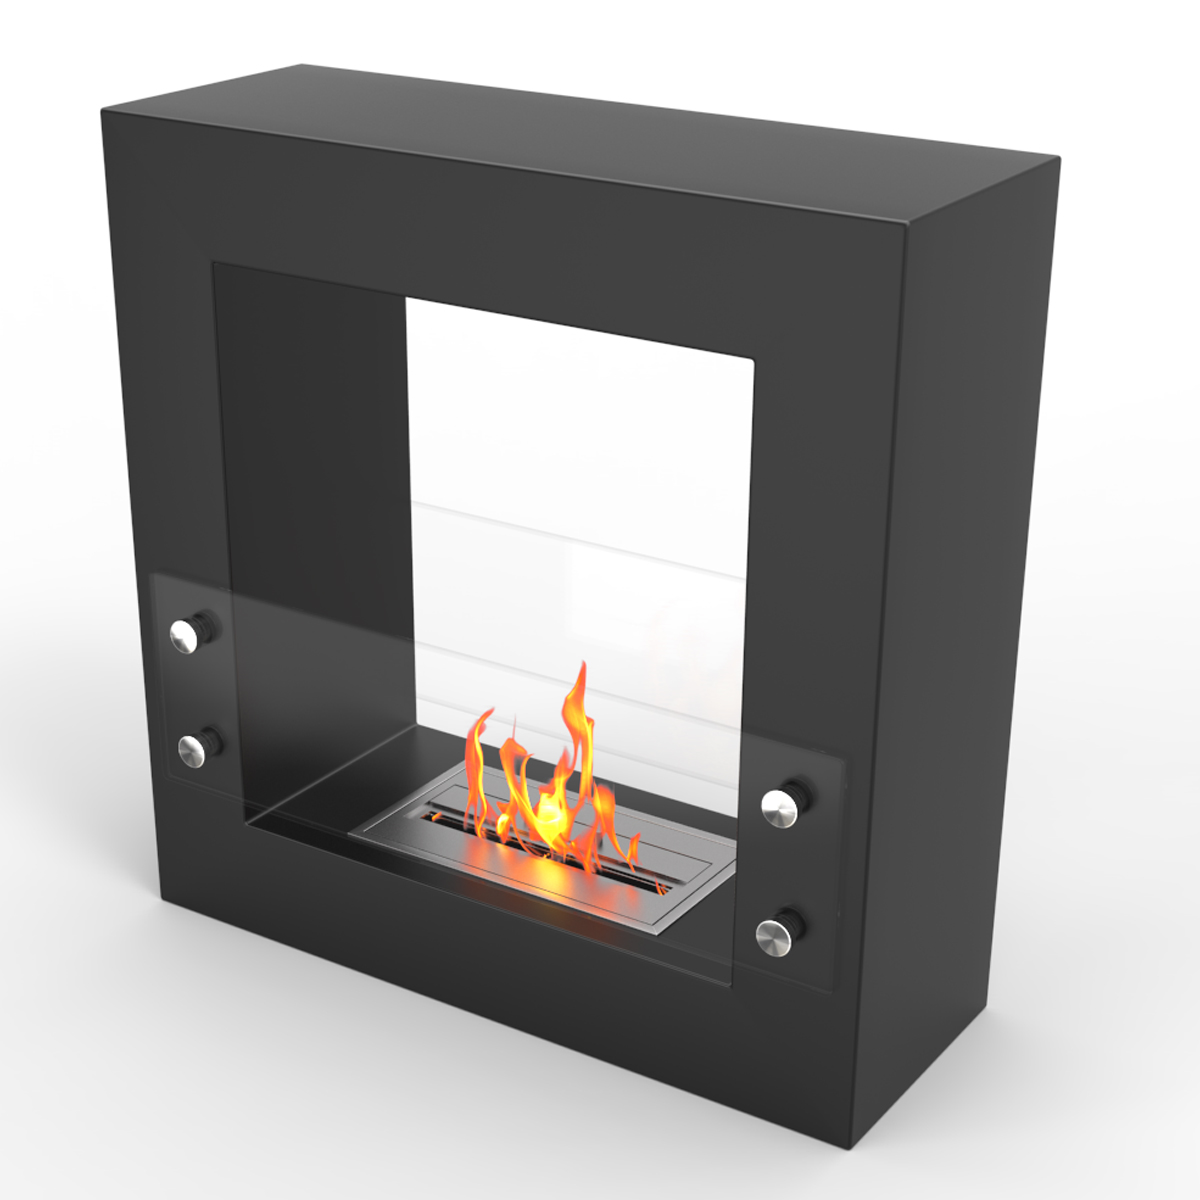 Dora Ventless Free Standing Ethanol Fireplace In Black